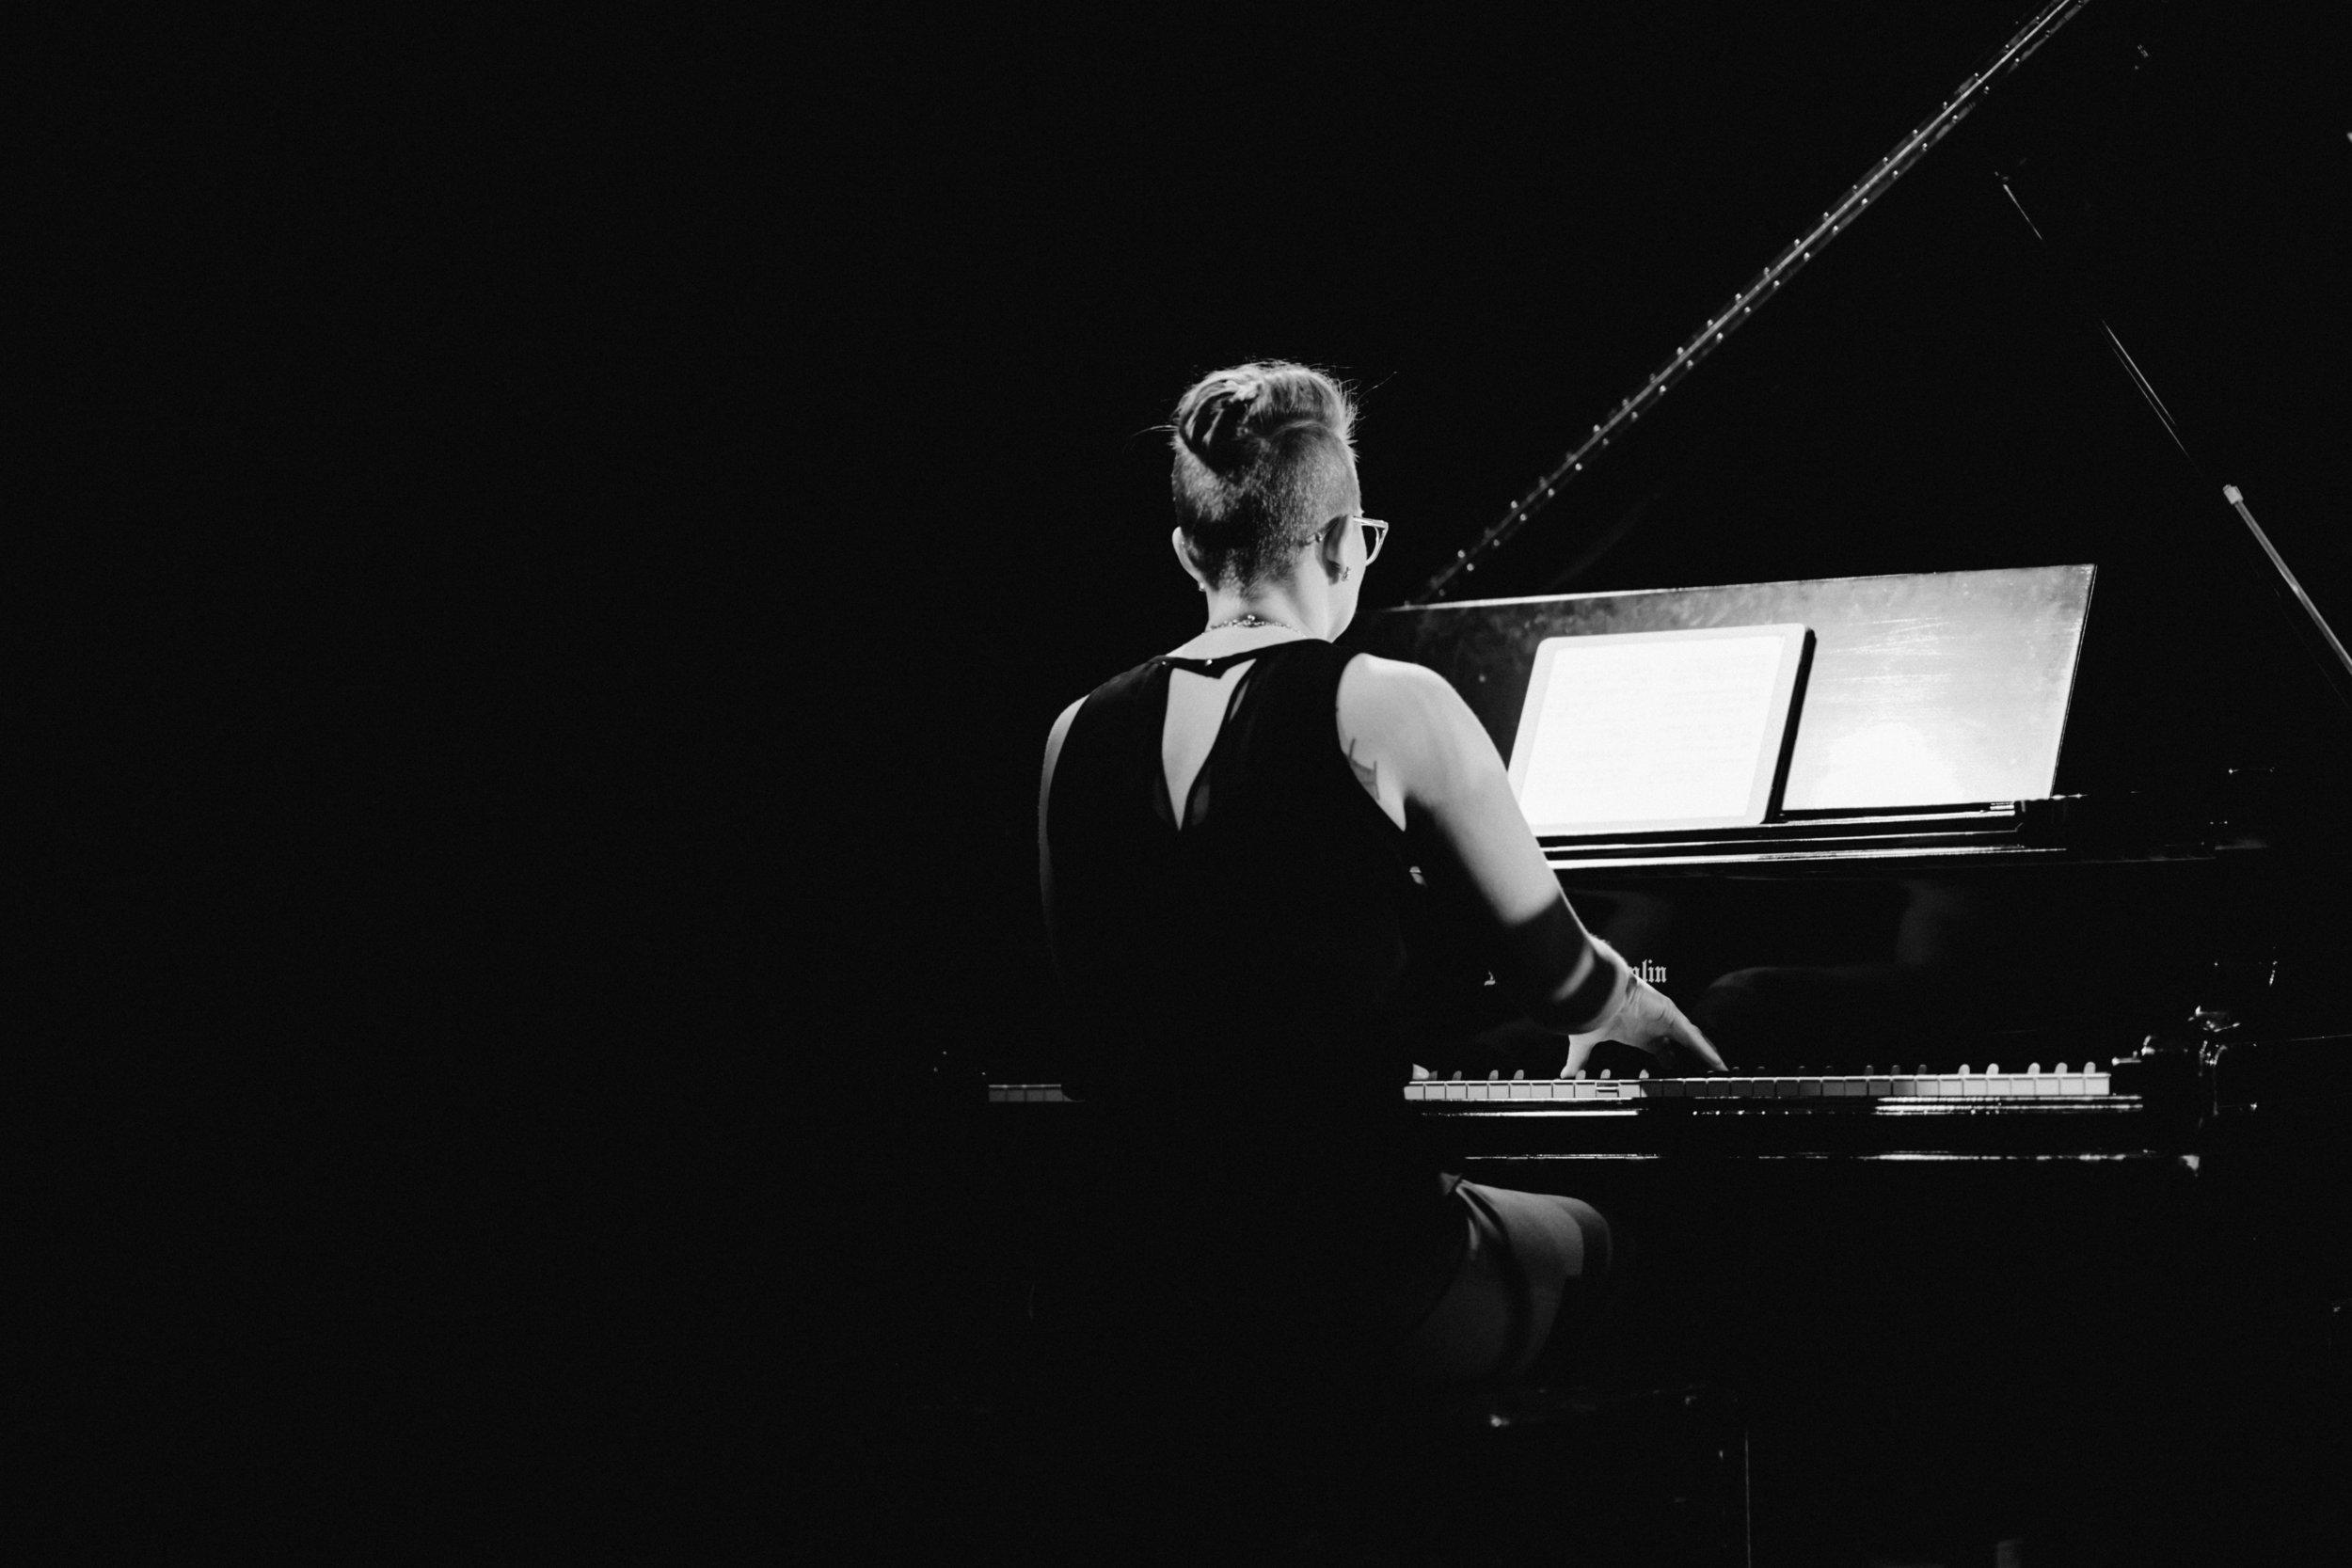 folky & electric - Ravel / Sonata No 2 for Violin and PianoMozart / Sonata K 304 for Piano and ViolinMilhaud / Sonata No 2 for Violin and PianoBartók / Sonata No 2 for Violin and Piano